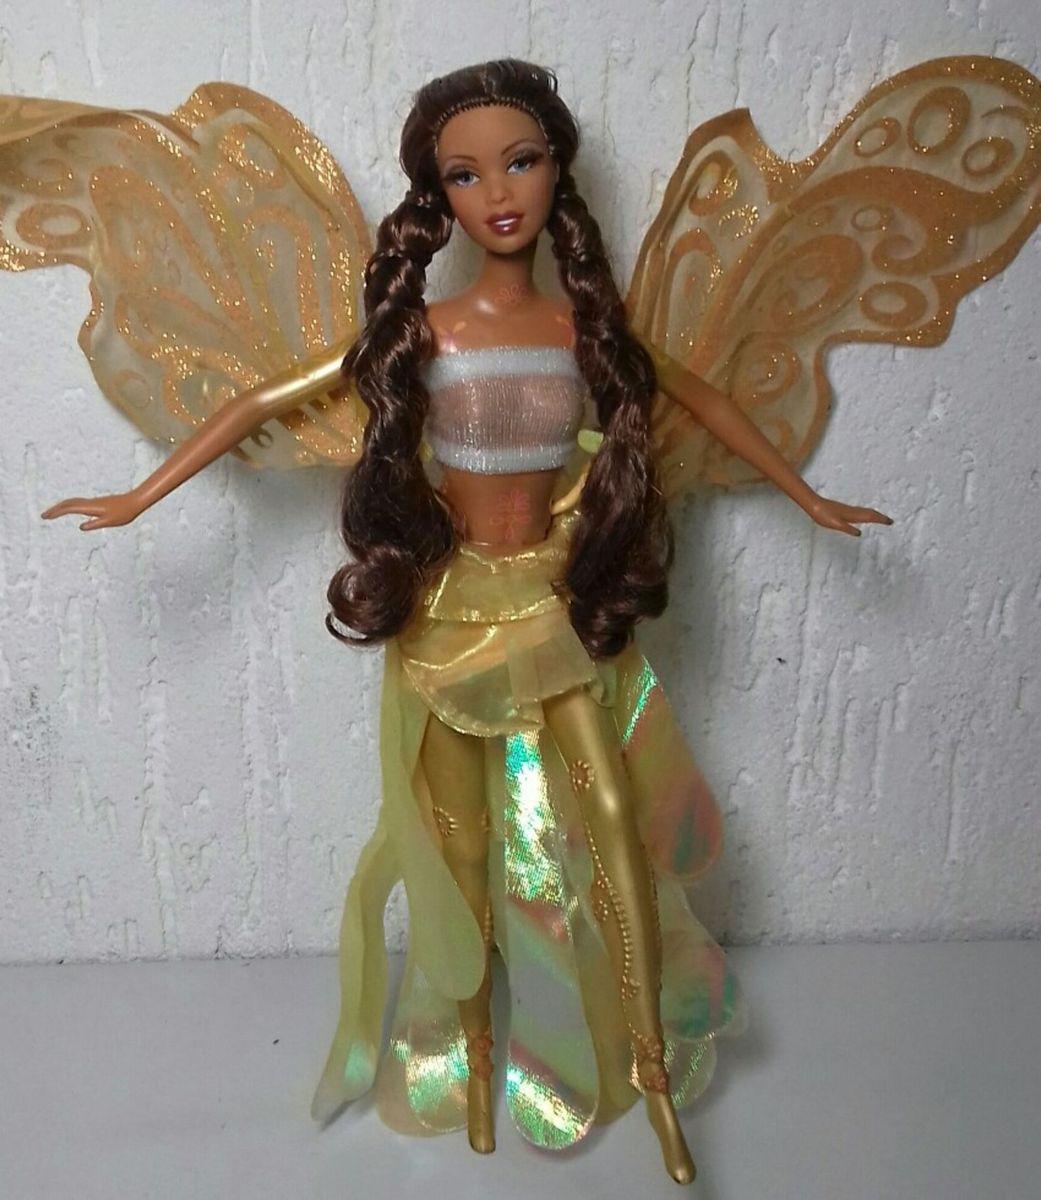 63a948f6a Boneca Barbie Farytopia Mattel Morena Rara | Brinquedo Mattel Usado ...